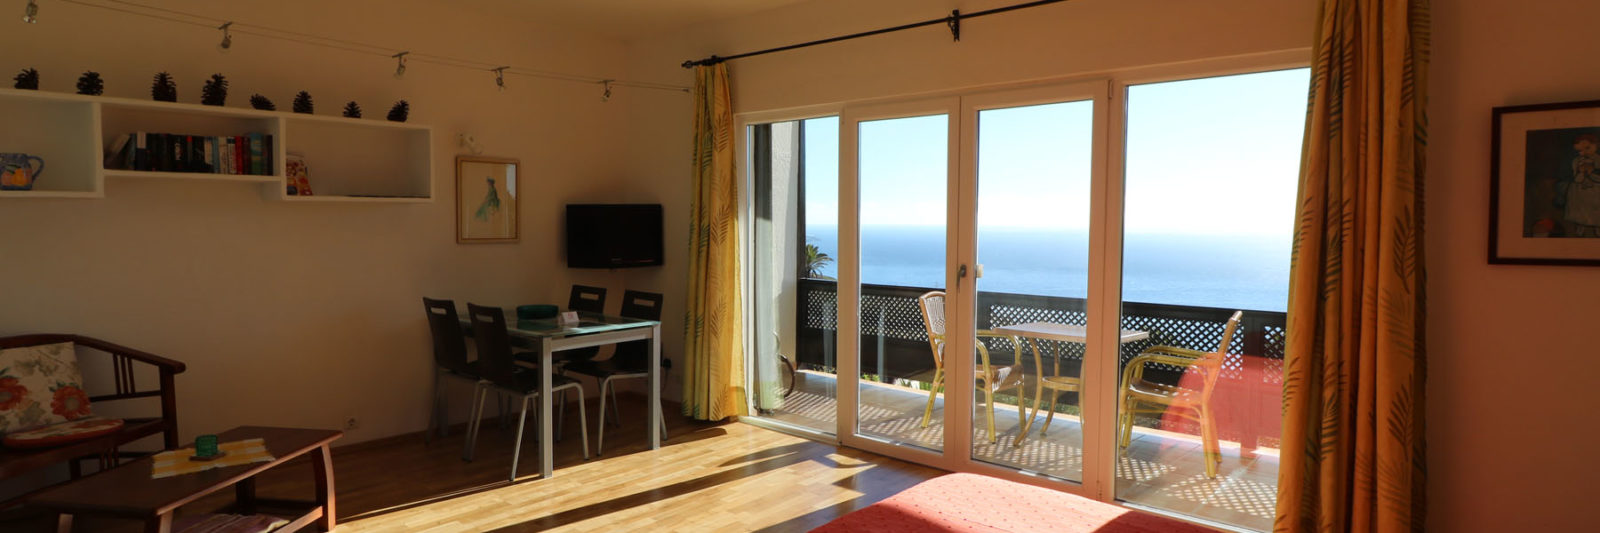 La Palma - Apartments Miranda - Studio